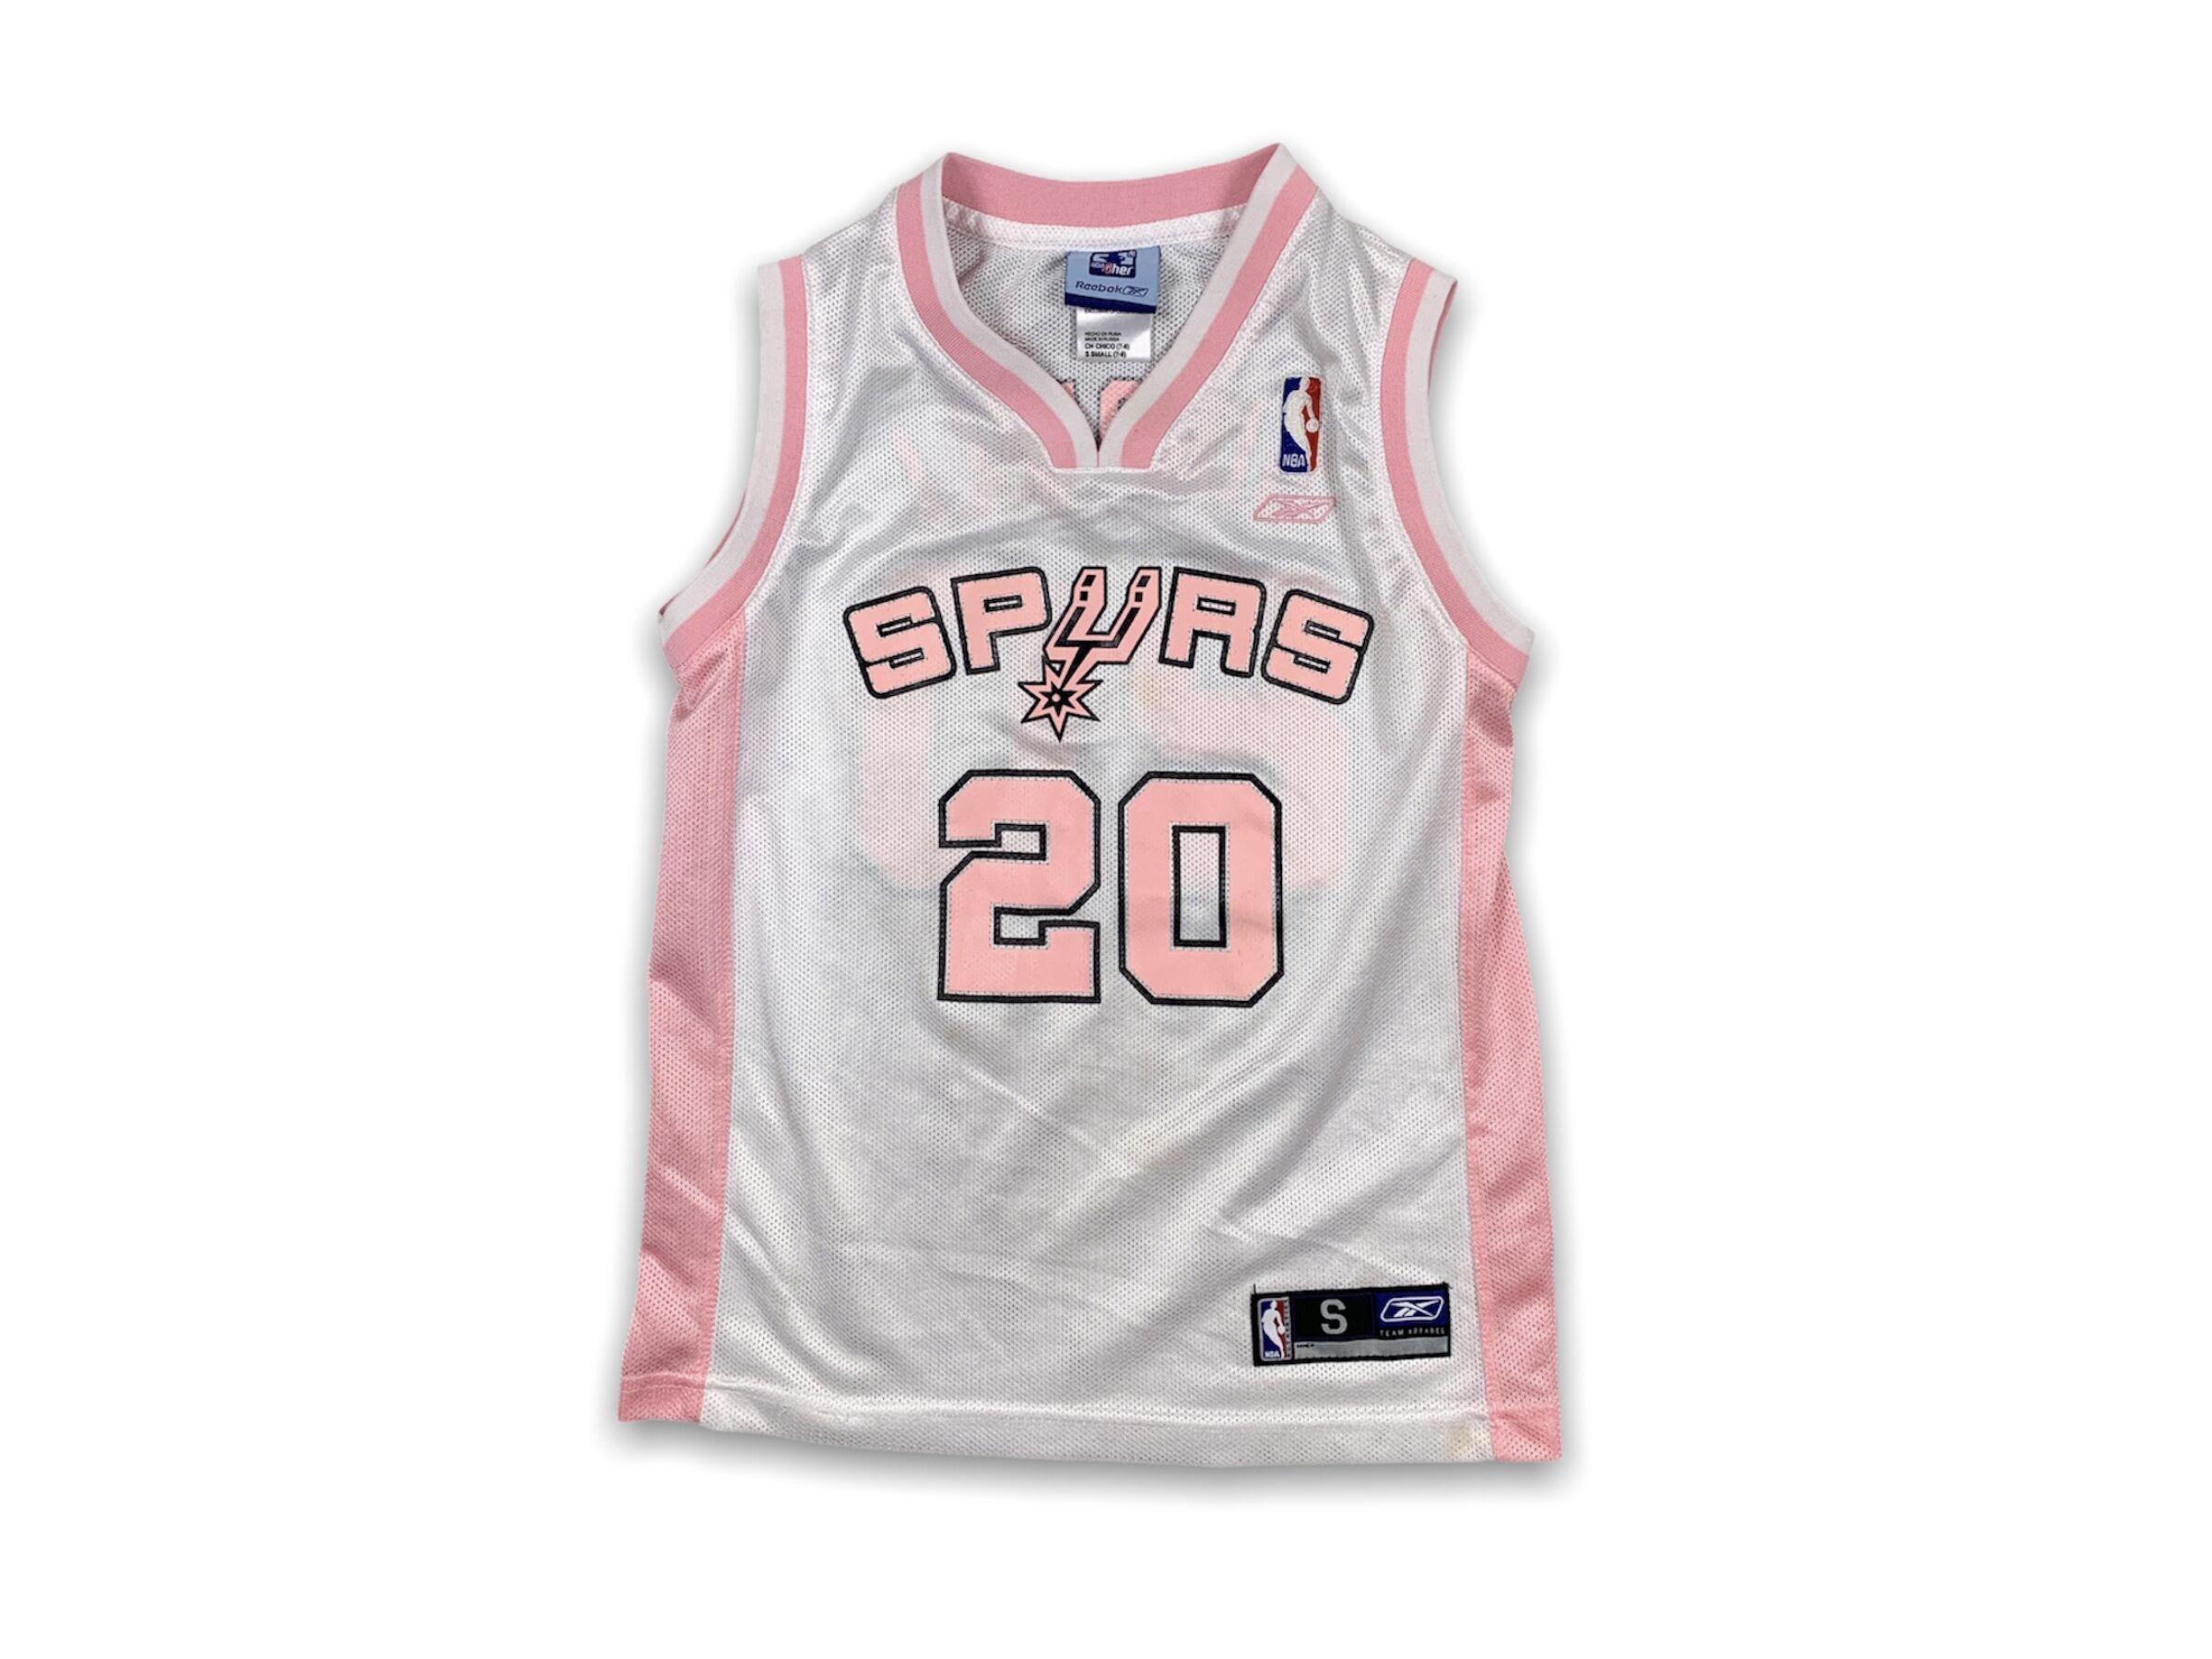 Reebok San Antonio Spurs Ginobili mez (Gyerek S, 7-8 év)